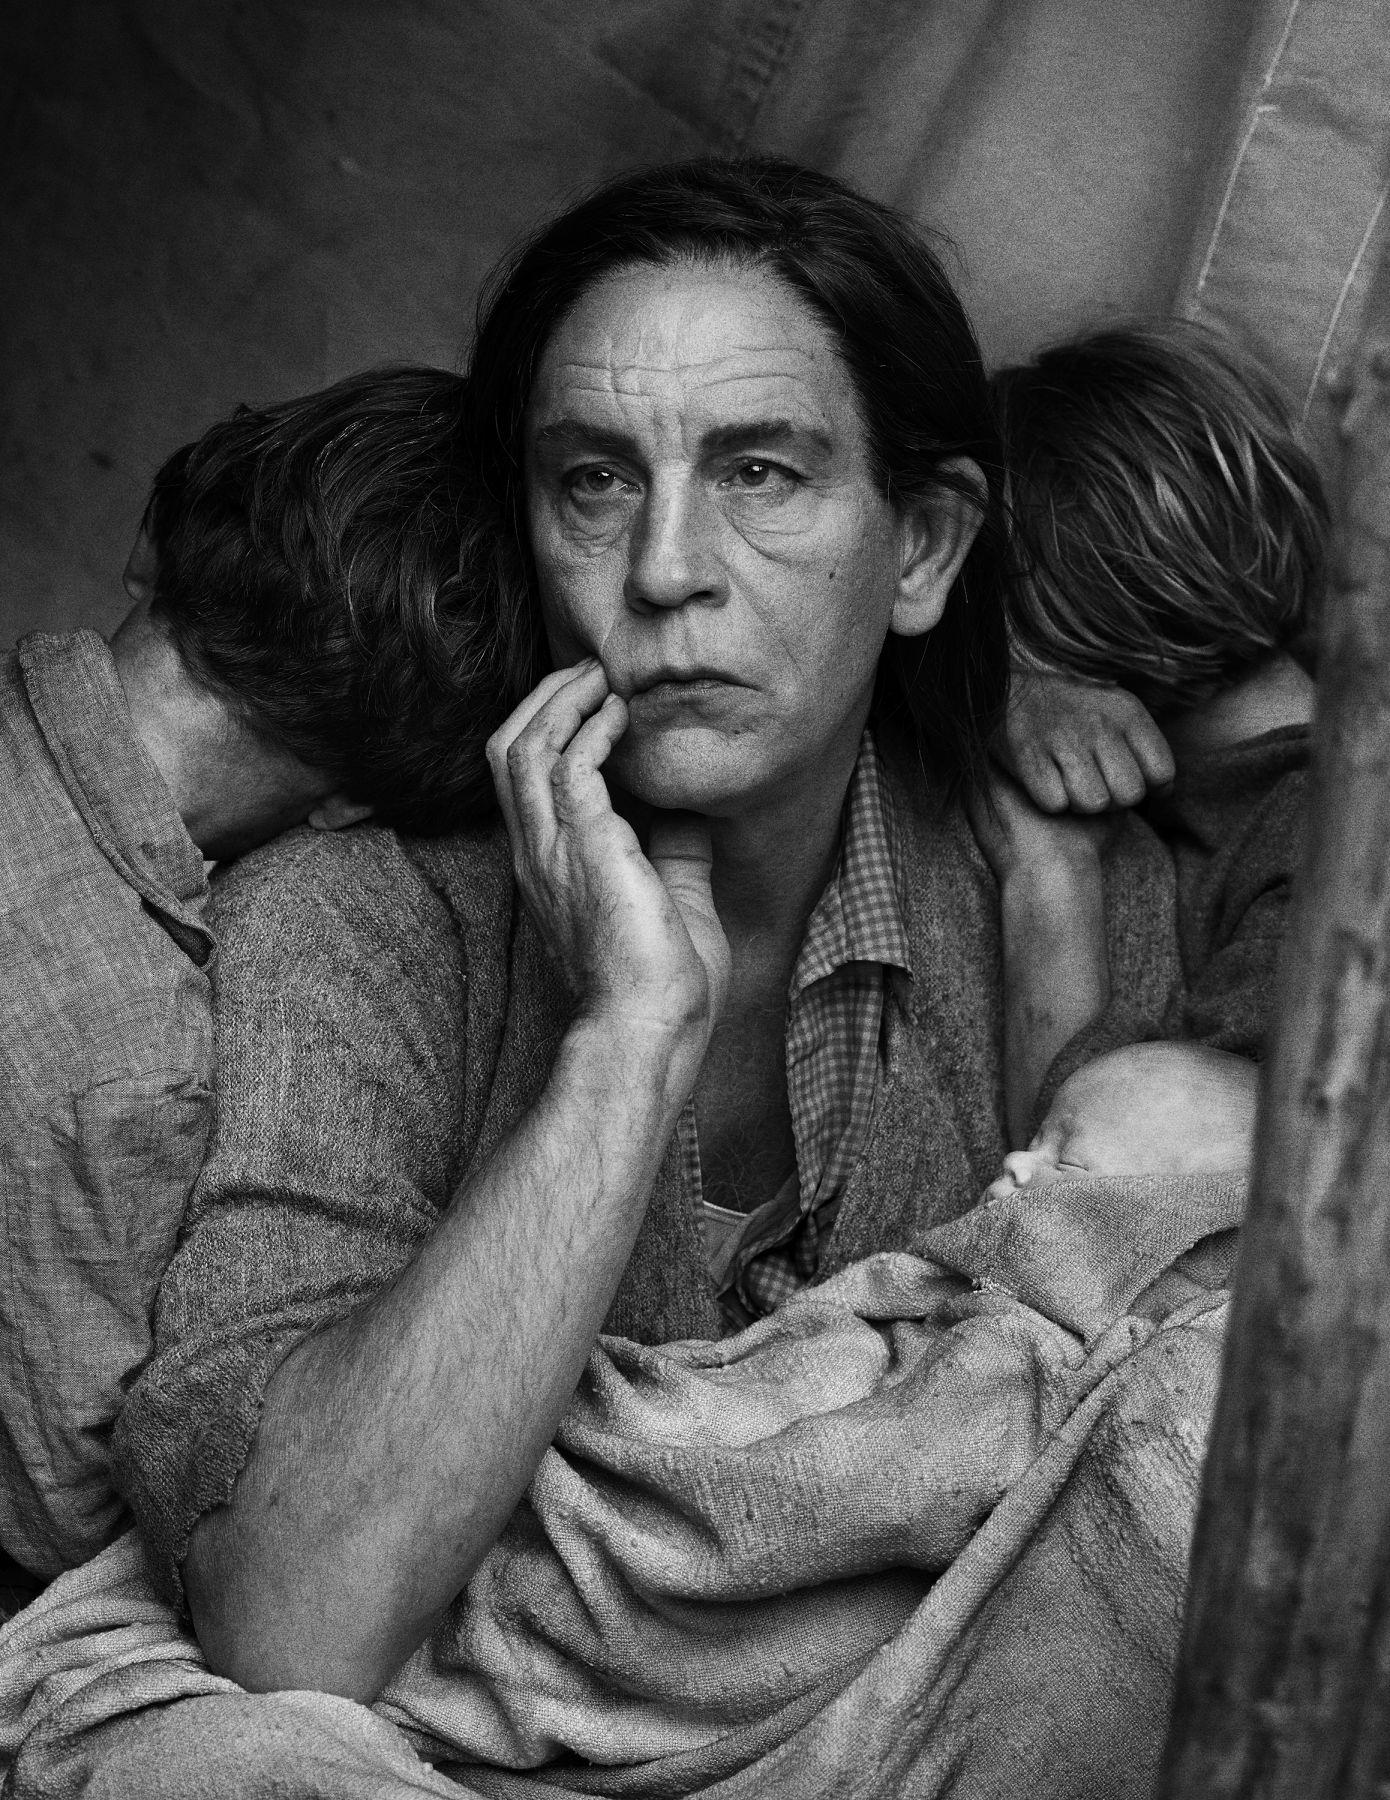 Dorothea Lange / Migrant Mother, Nipomo, California (1936), 2014